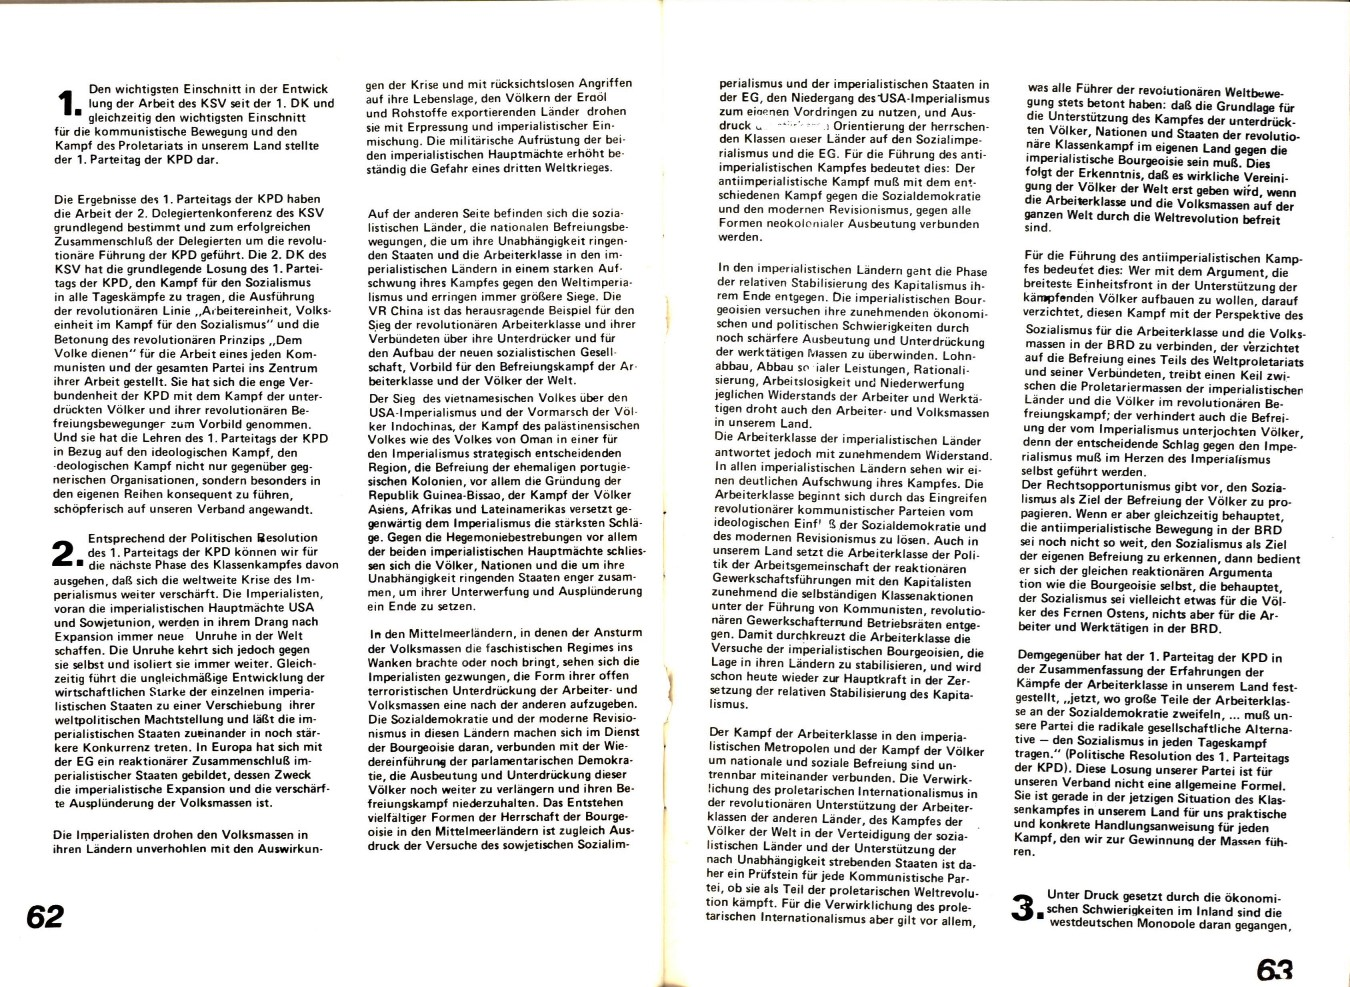 KSV_1974_Rechenschaftsbericht_33